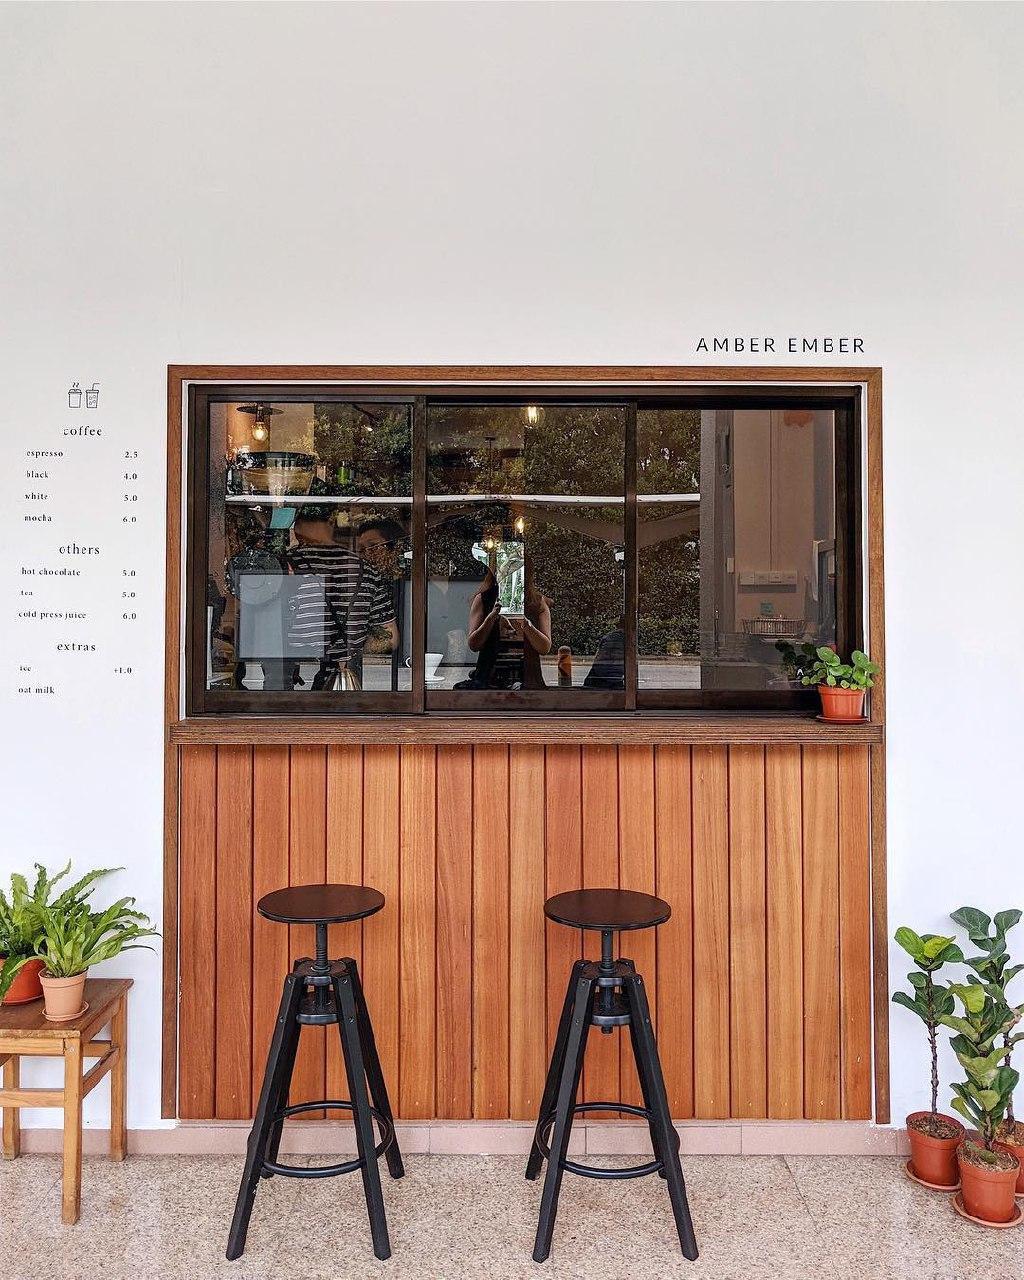 amber ember cafe exterior minimalism